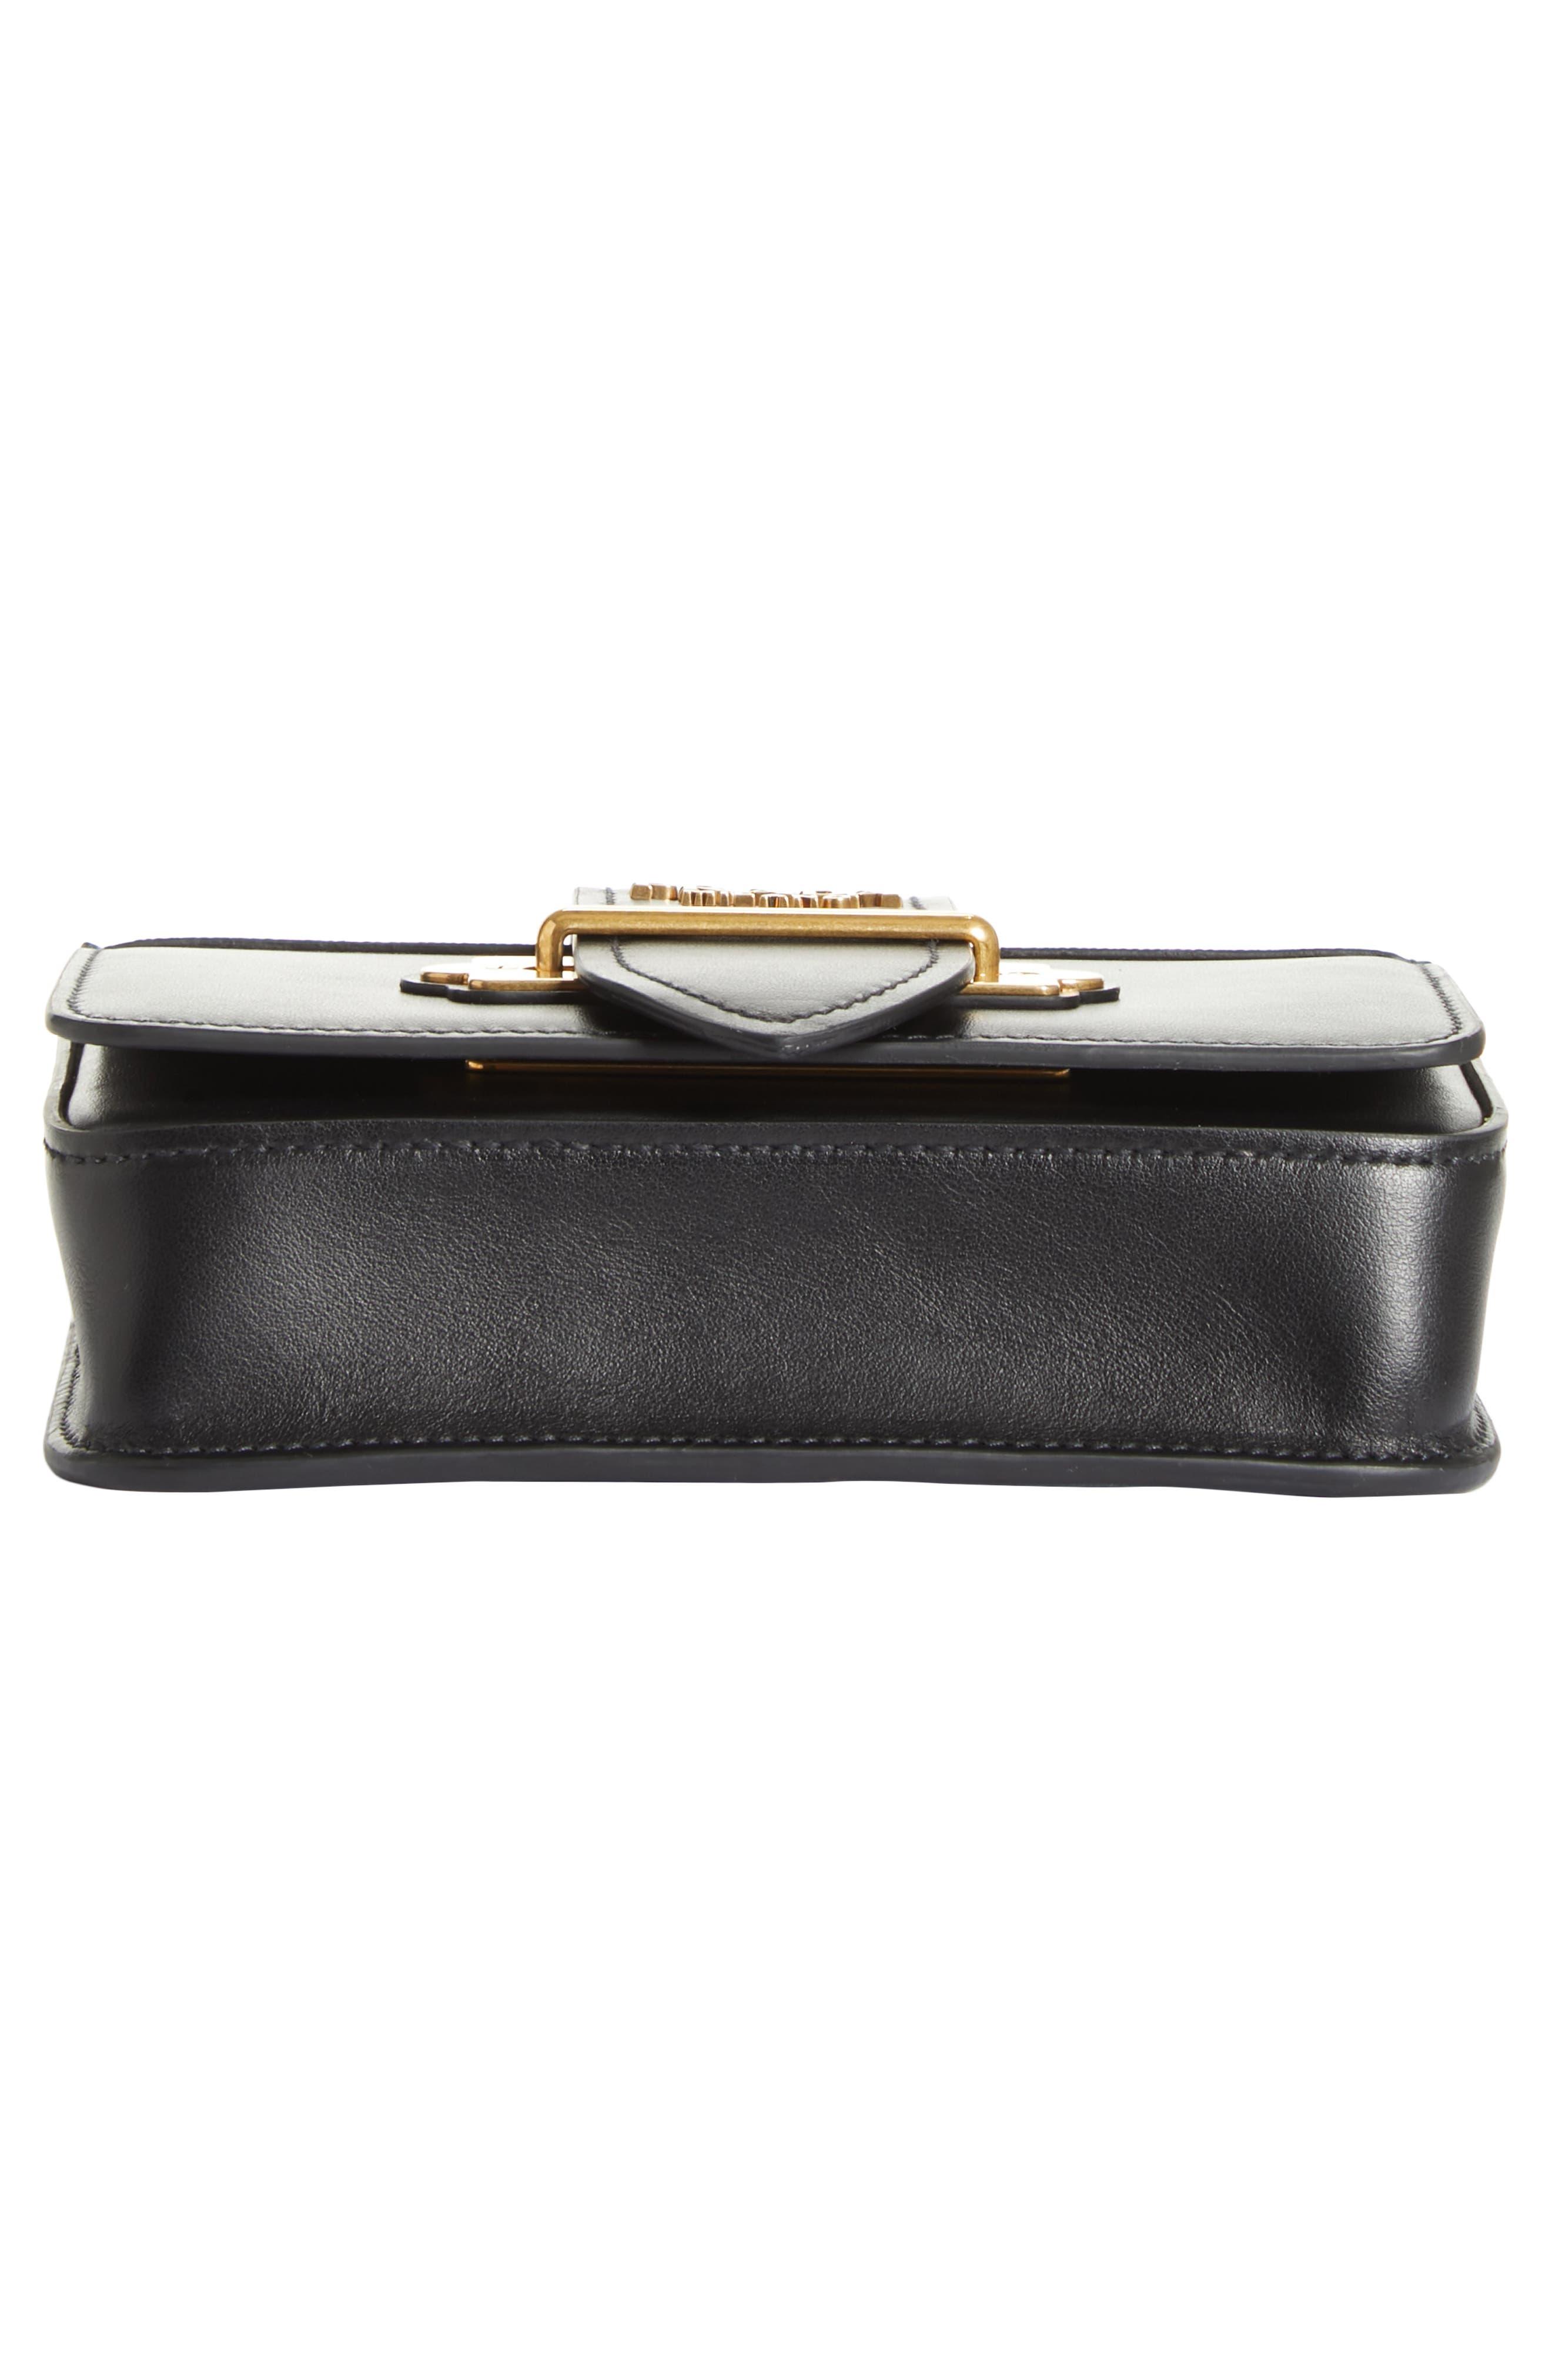 Cahier Calfskin Leather Convertible Belt Bag,                             Alternate thumbnail 6, color,                             001